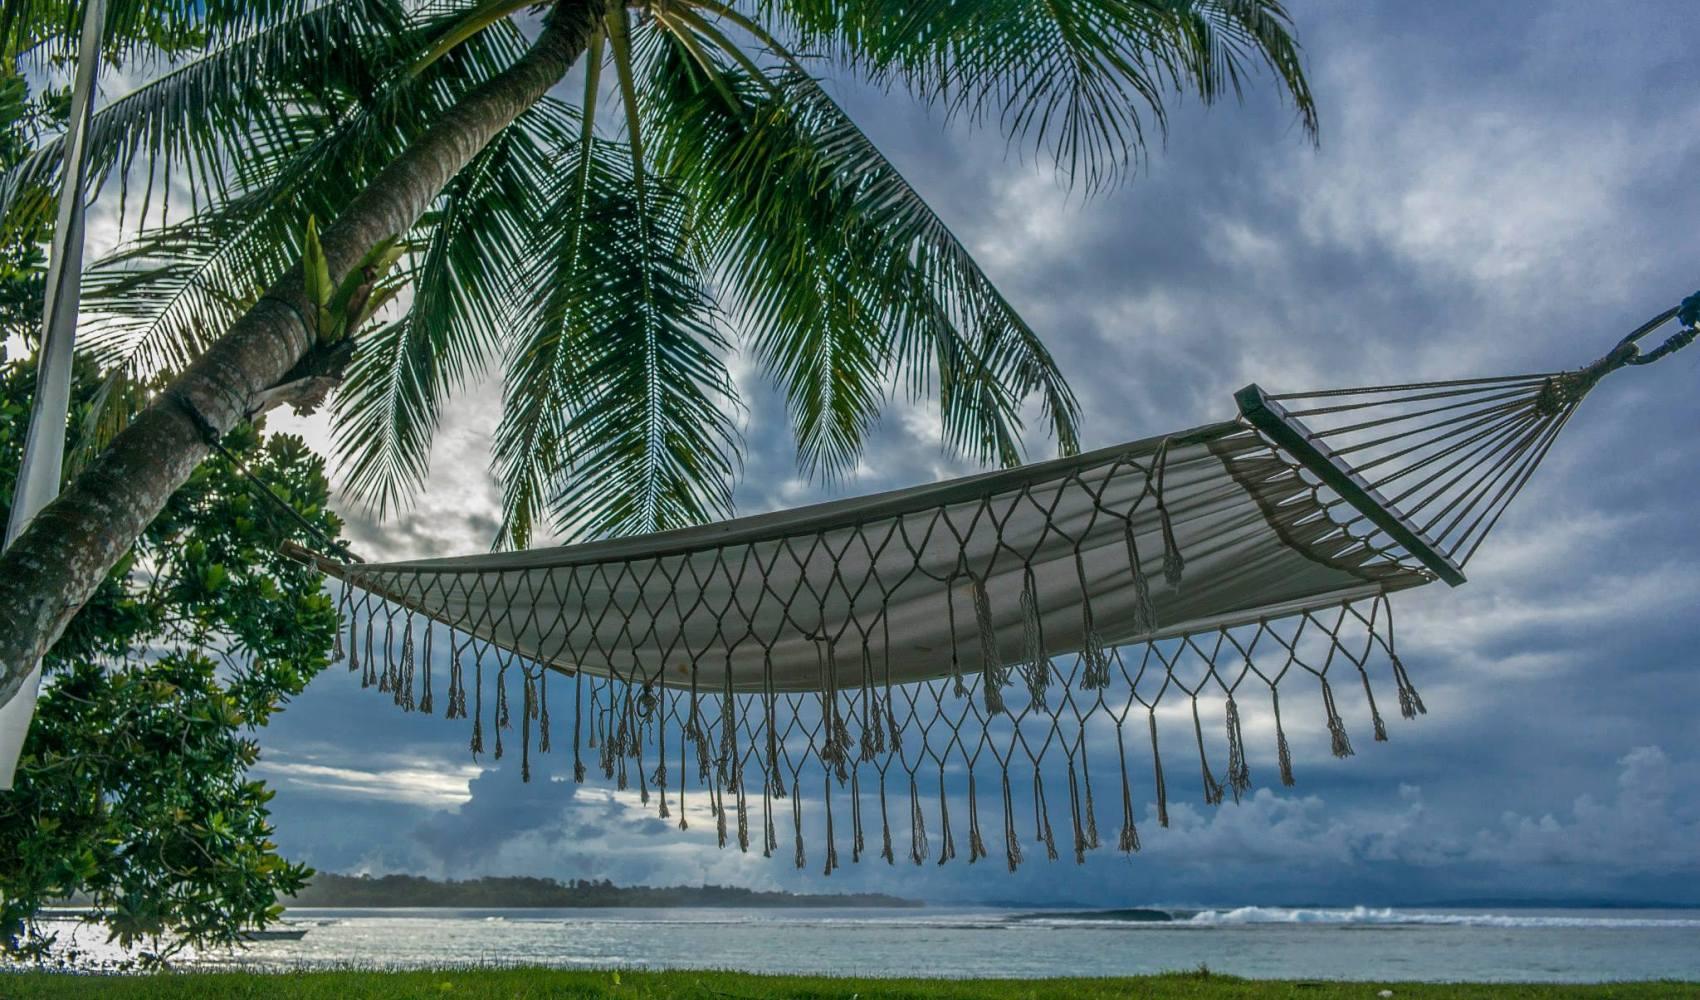 Telo_Island_Lodge_Hammock_Surf.jpg